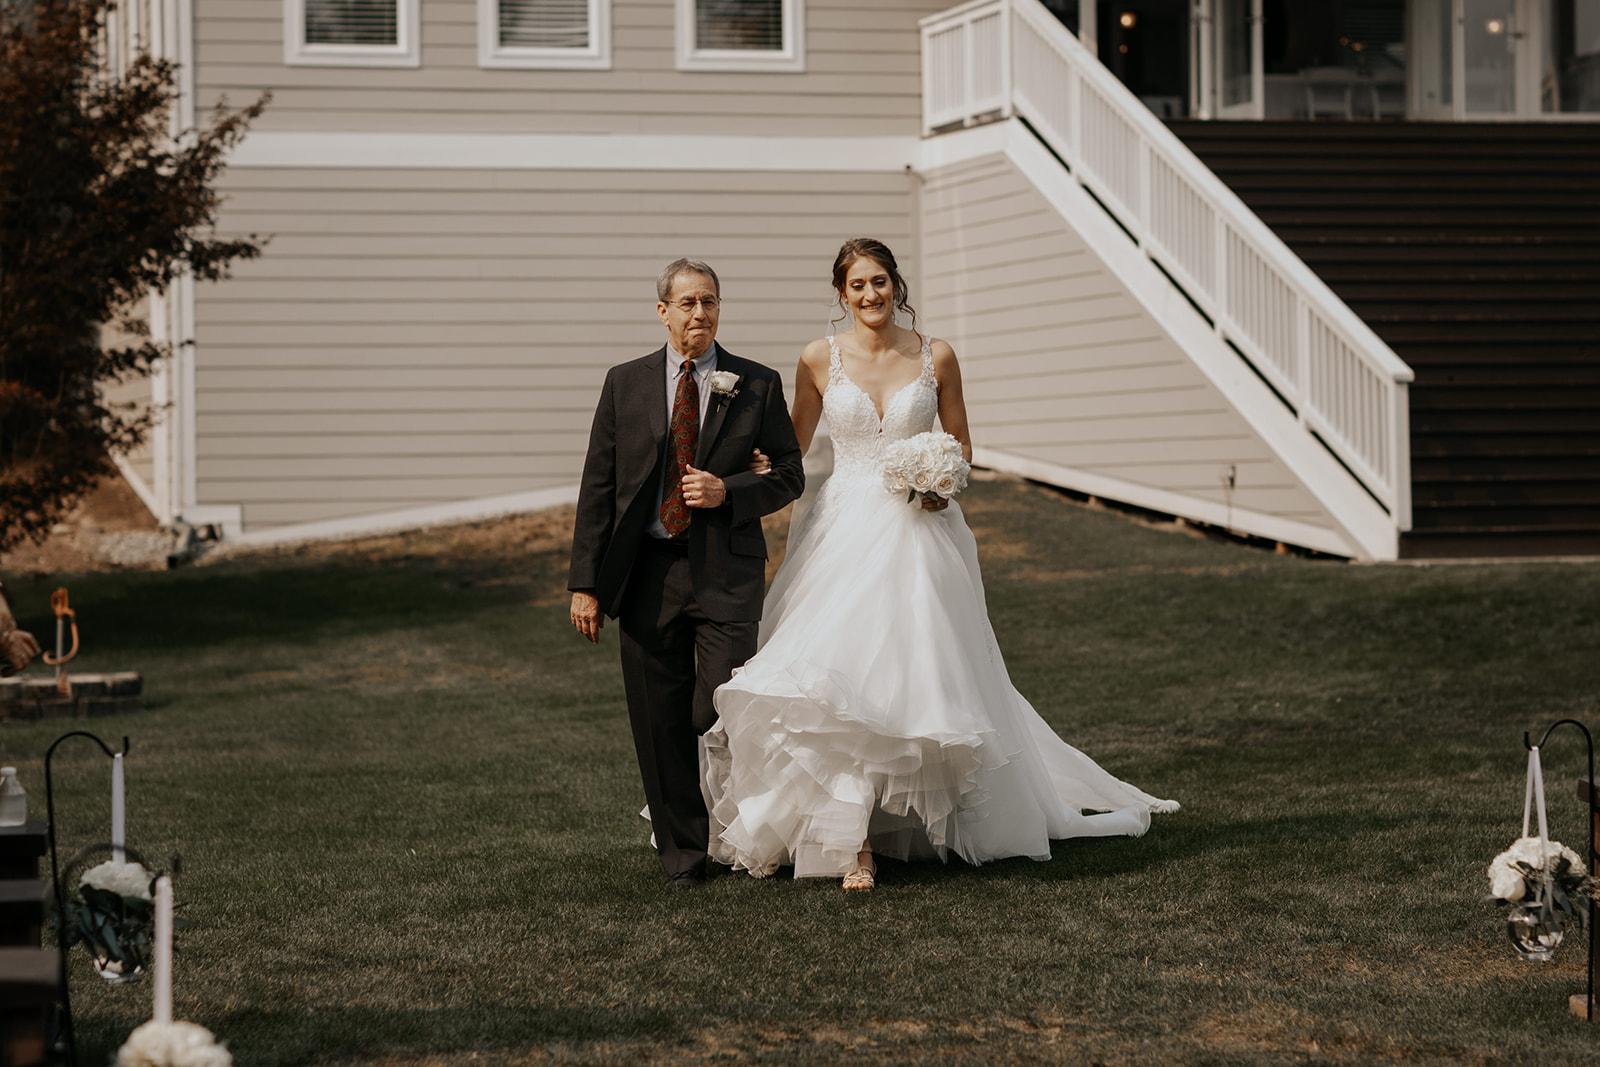 ginapaulson_camiryan_wedding-320.jpg